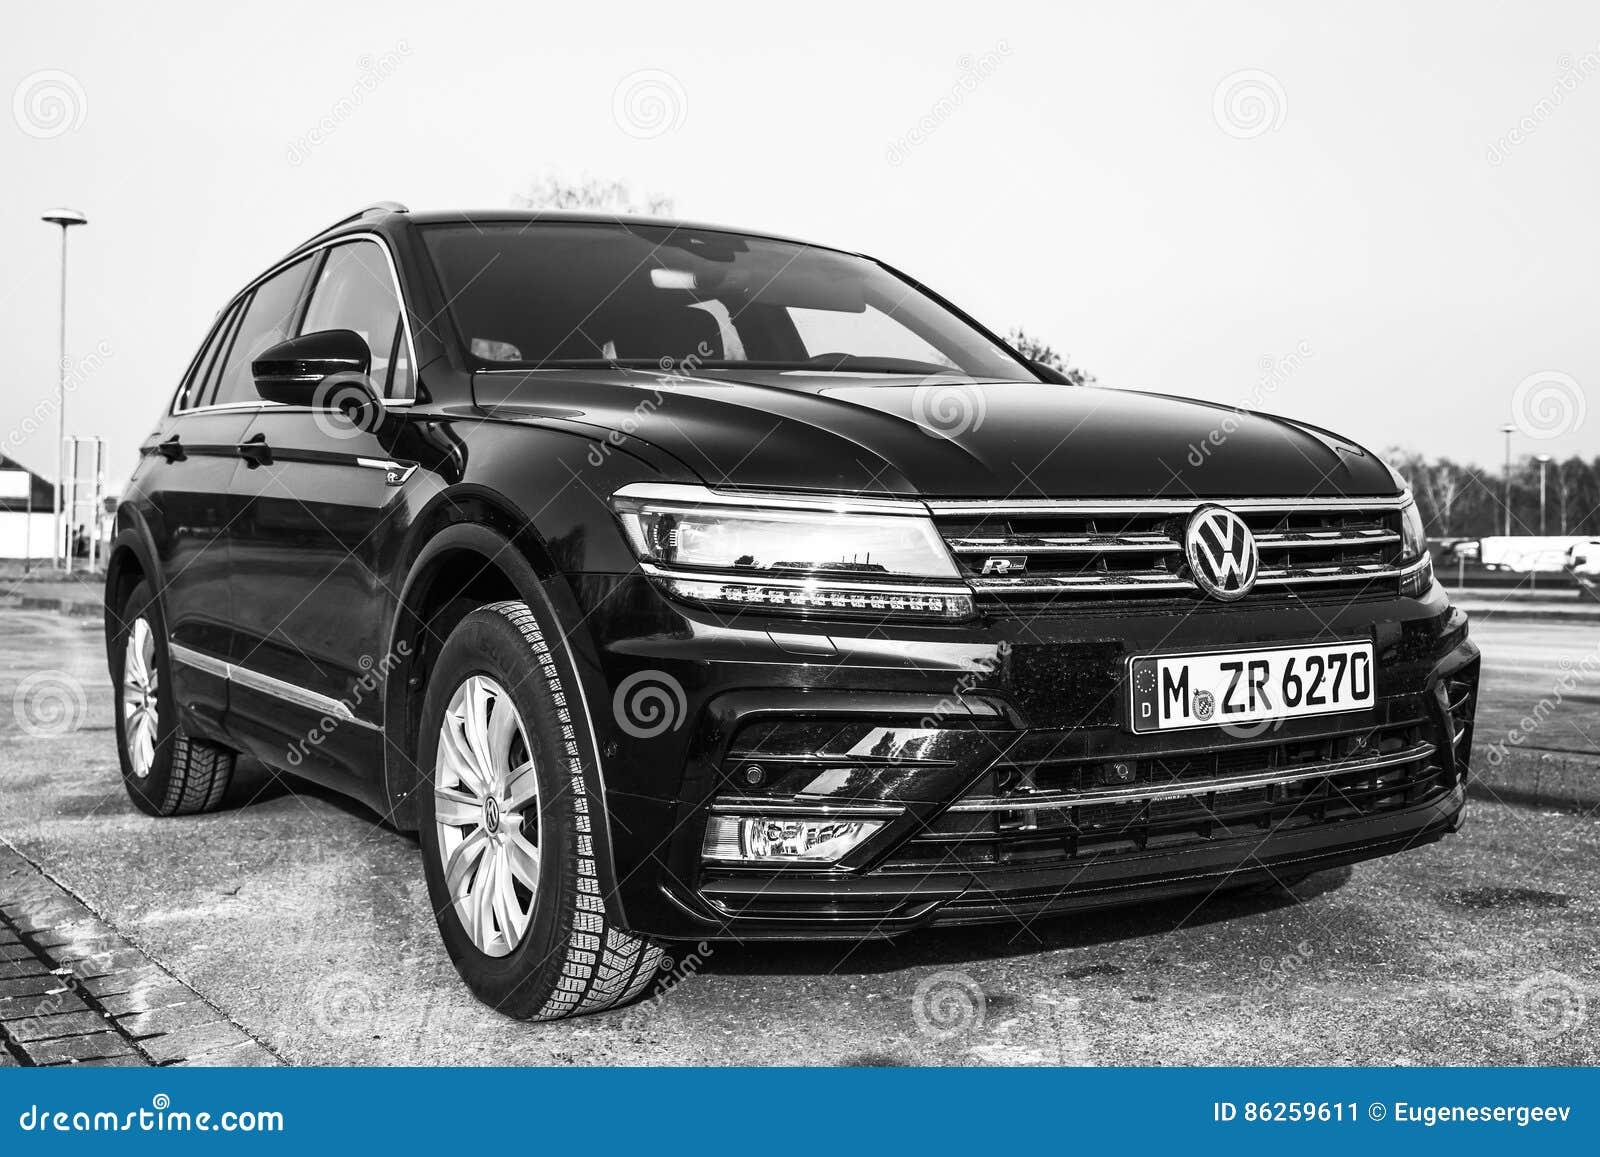 volkswagen tiguan 4x4 r line 2017 redaktionelles foto bild 86259611. Black Bedroom Furniture Sets. Home Design Ideas